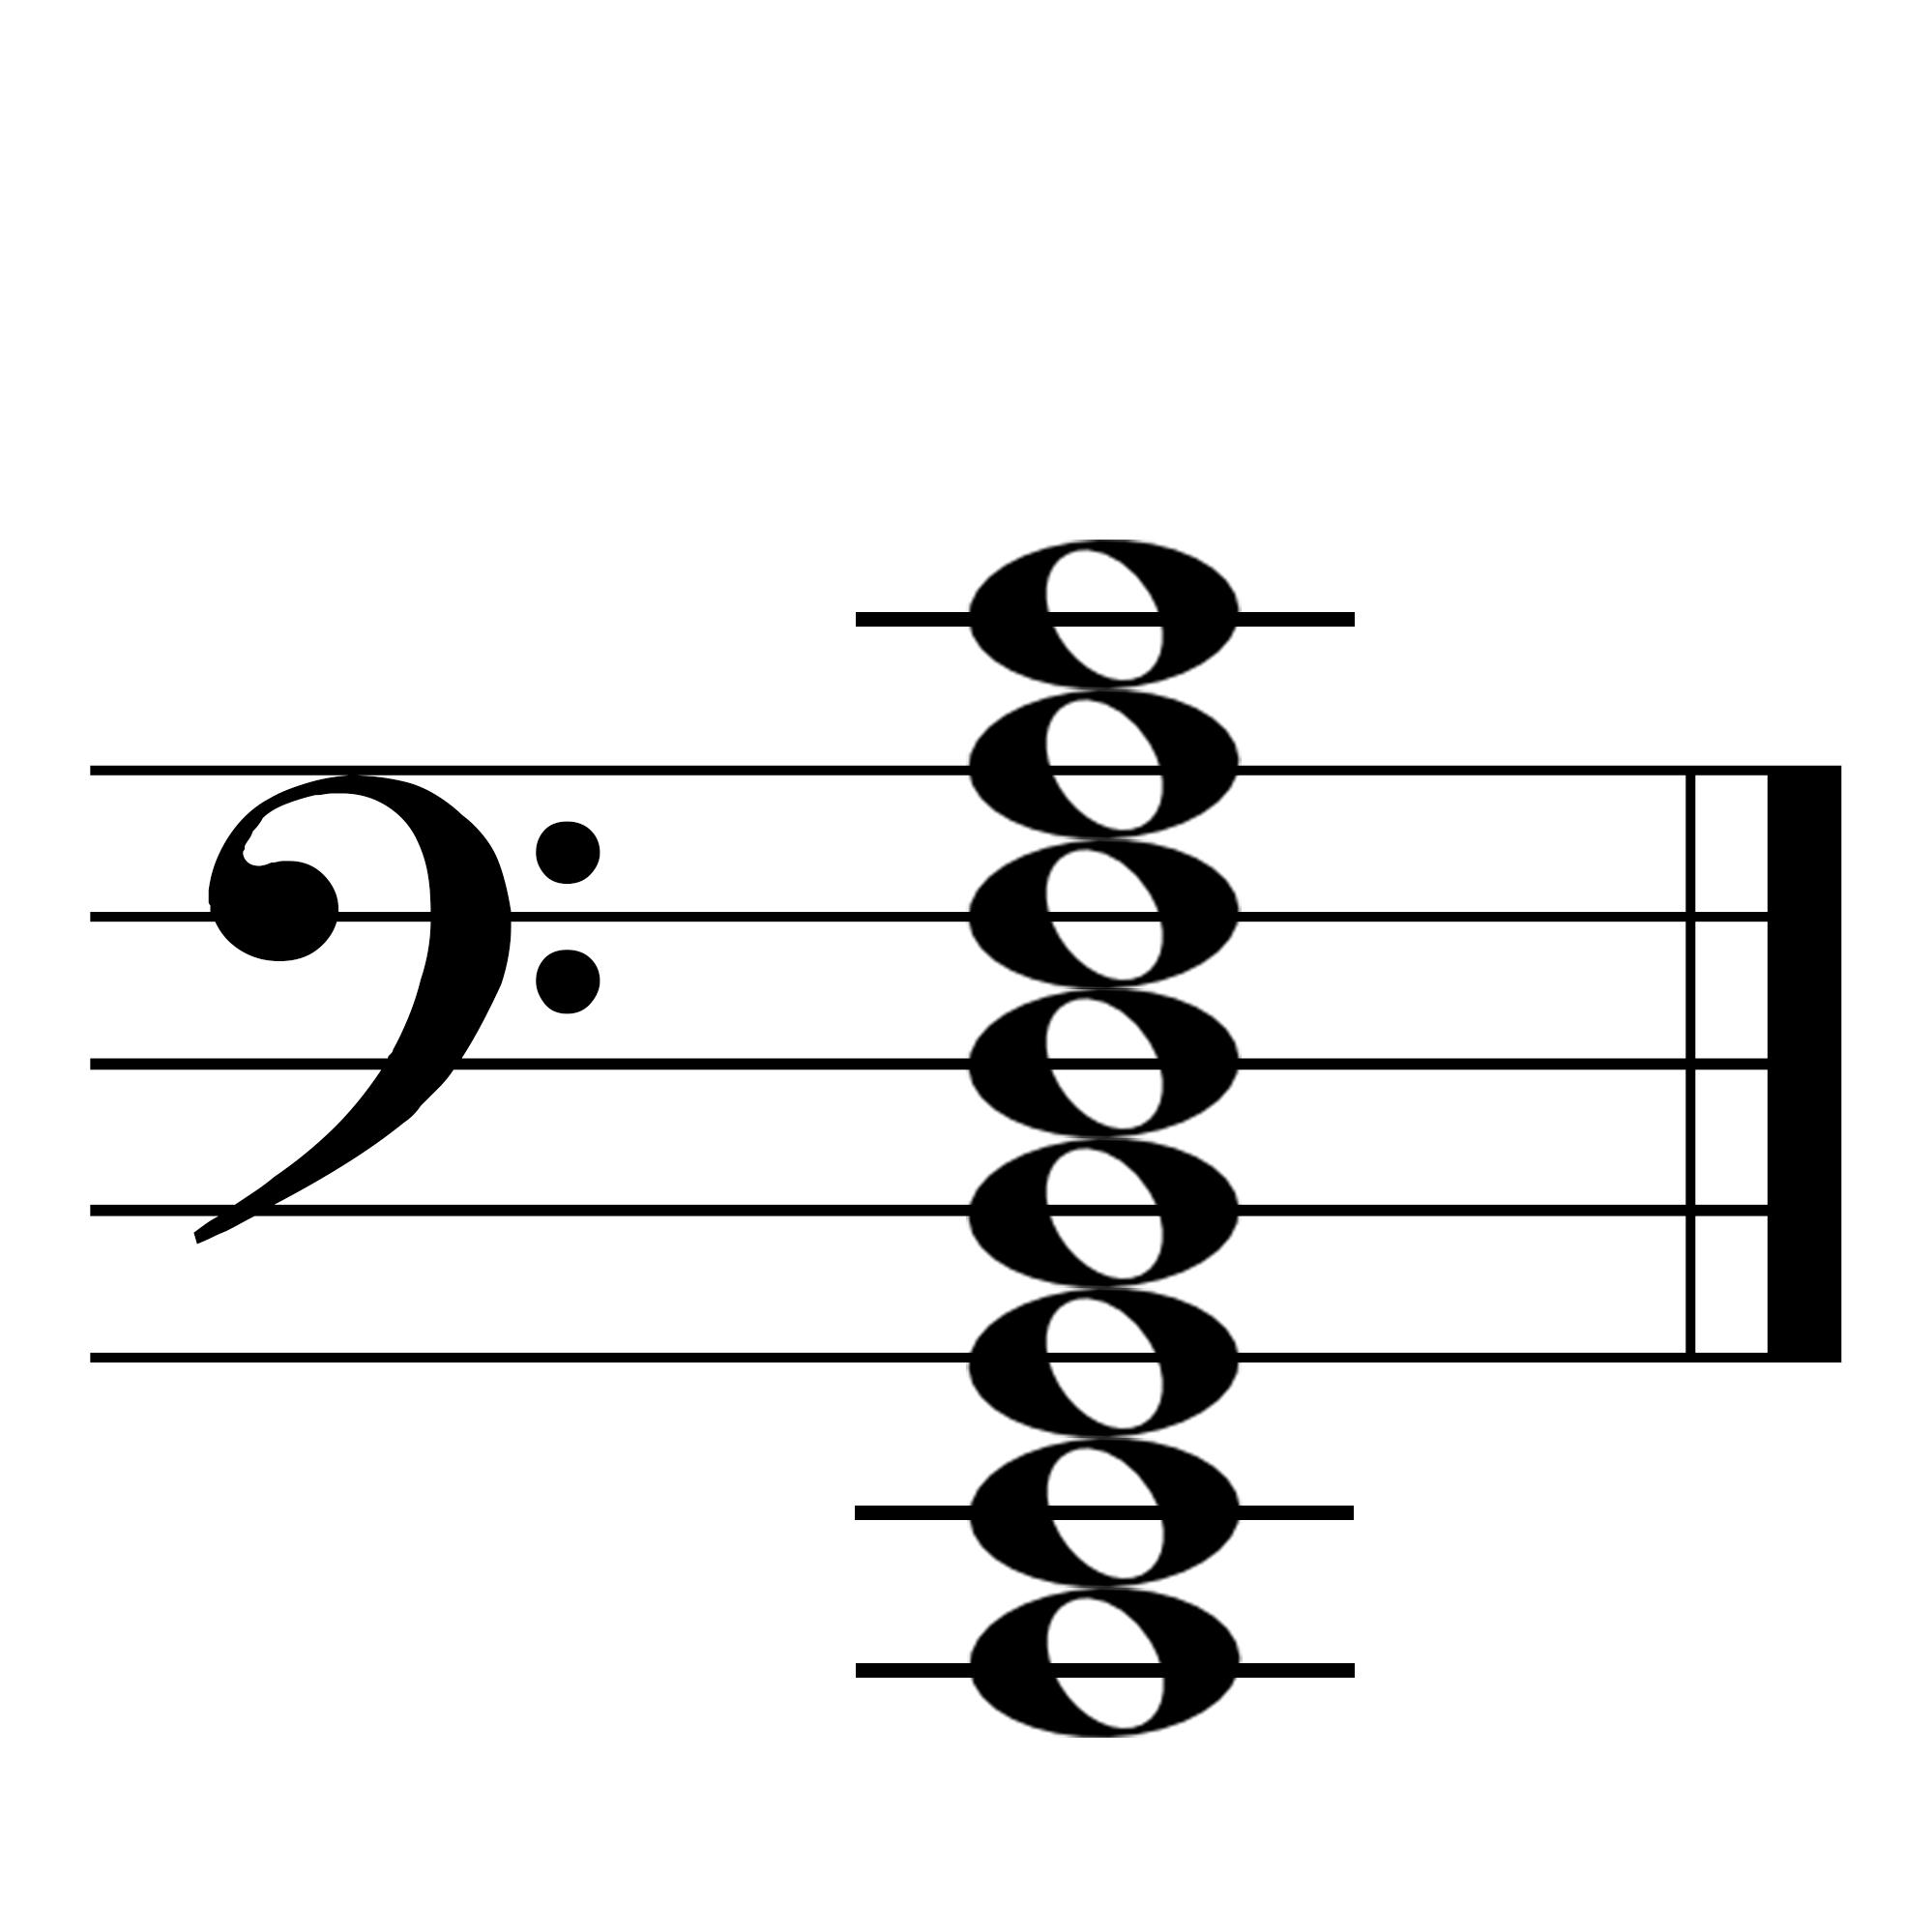 音符 記号 ヘ 音